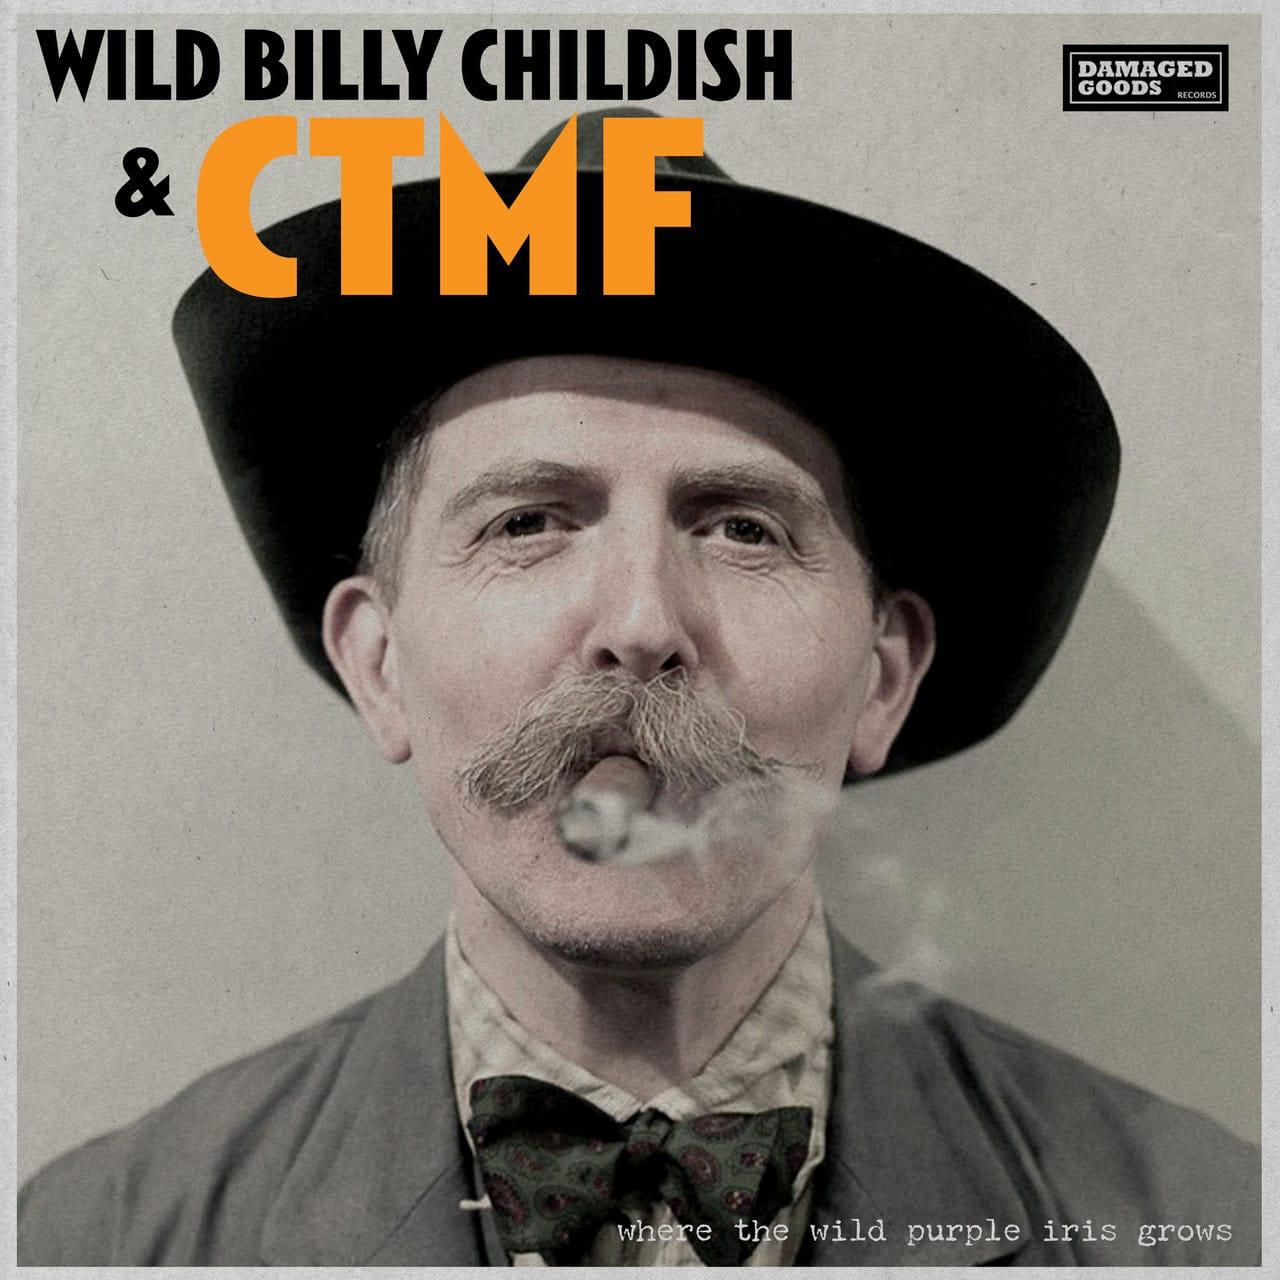 WILD BILLY CHILDISH & CTMF WHERE THE WILD PURPLE IRIS GROWS